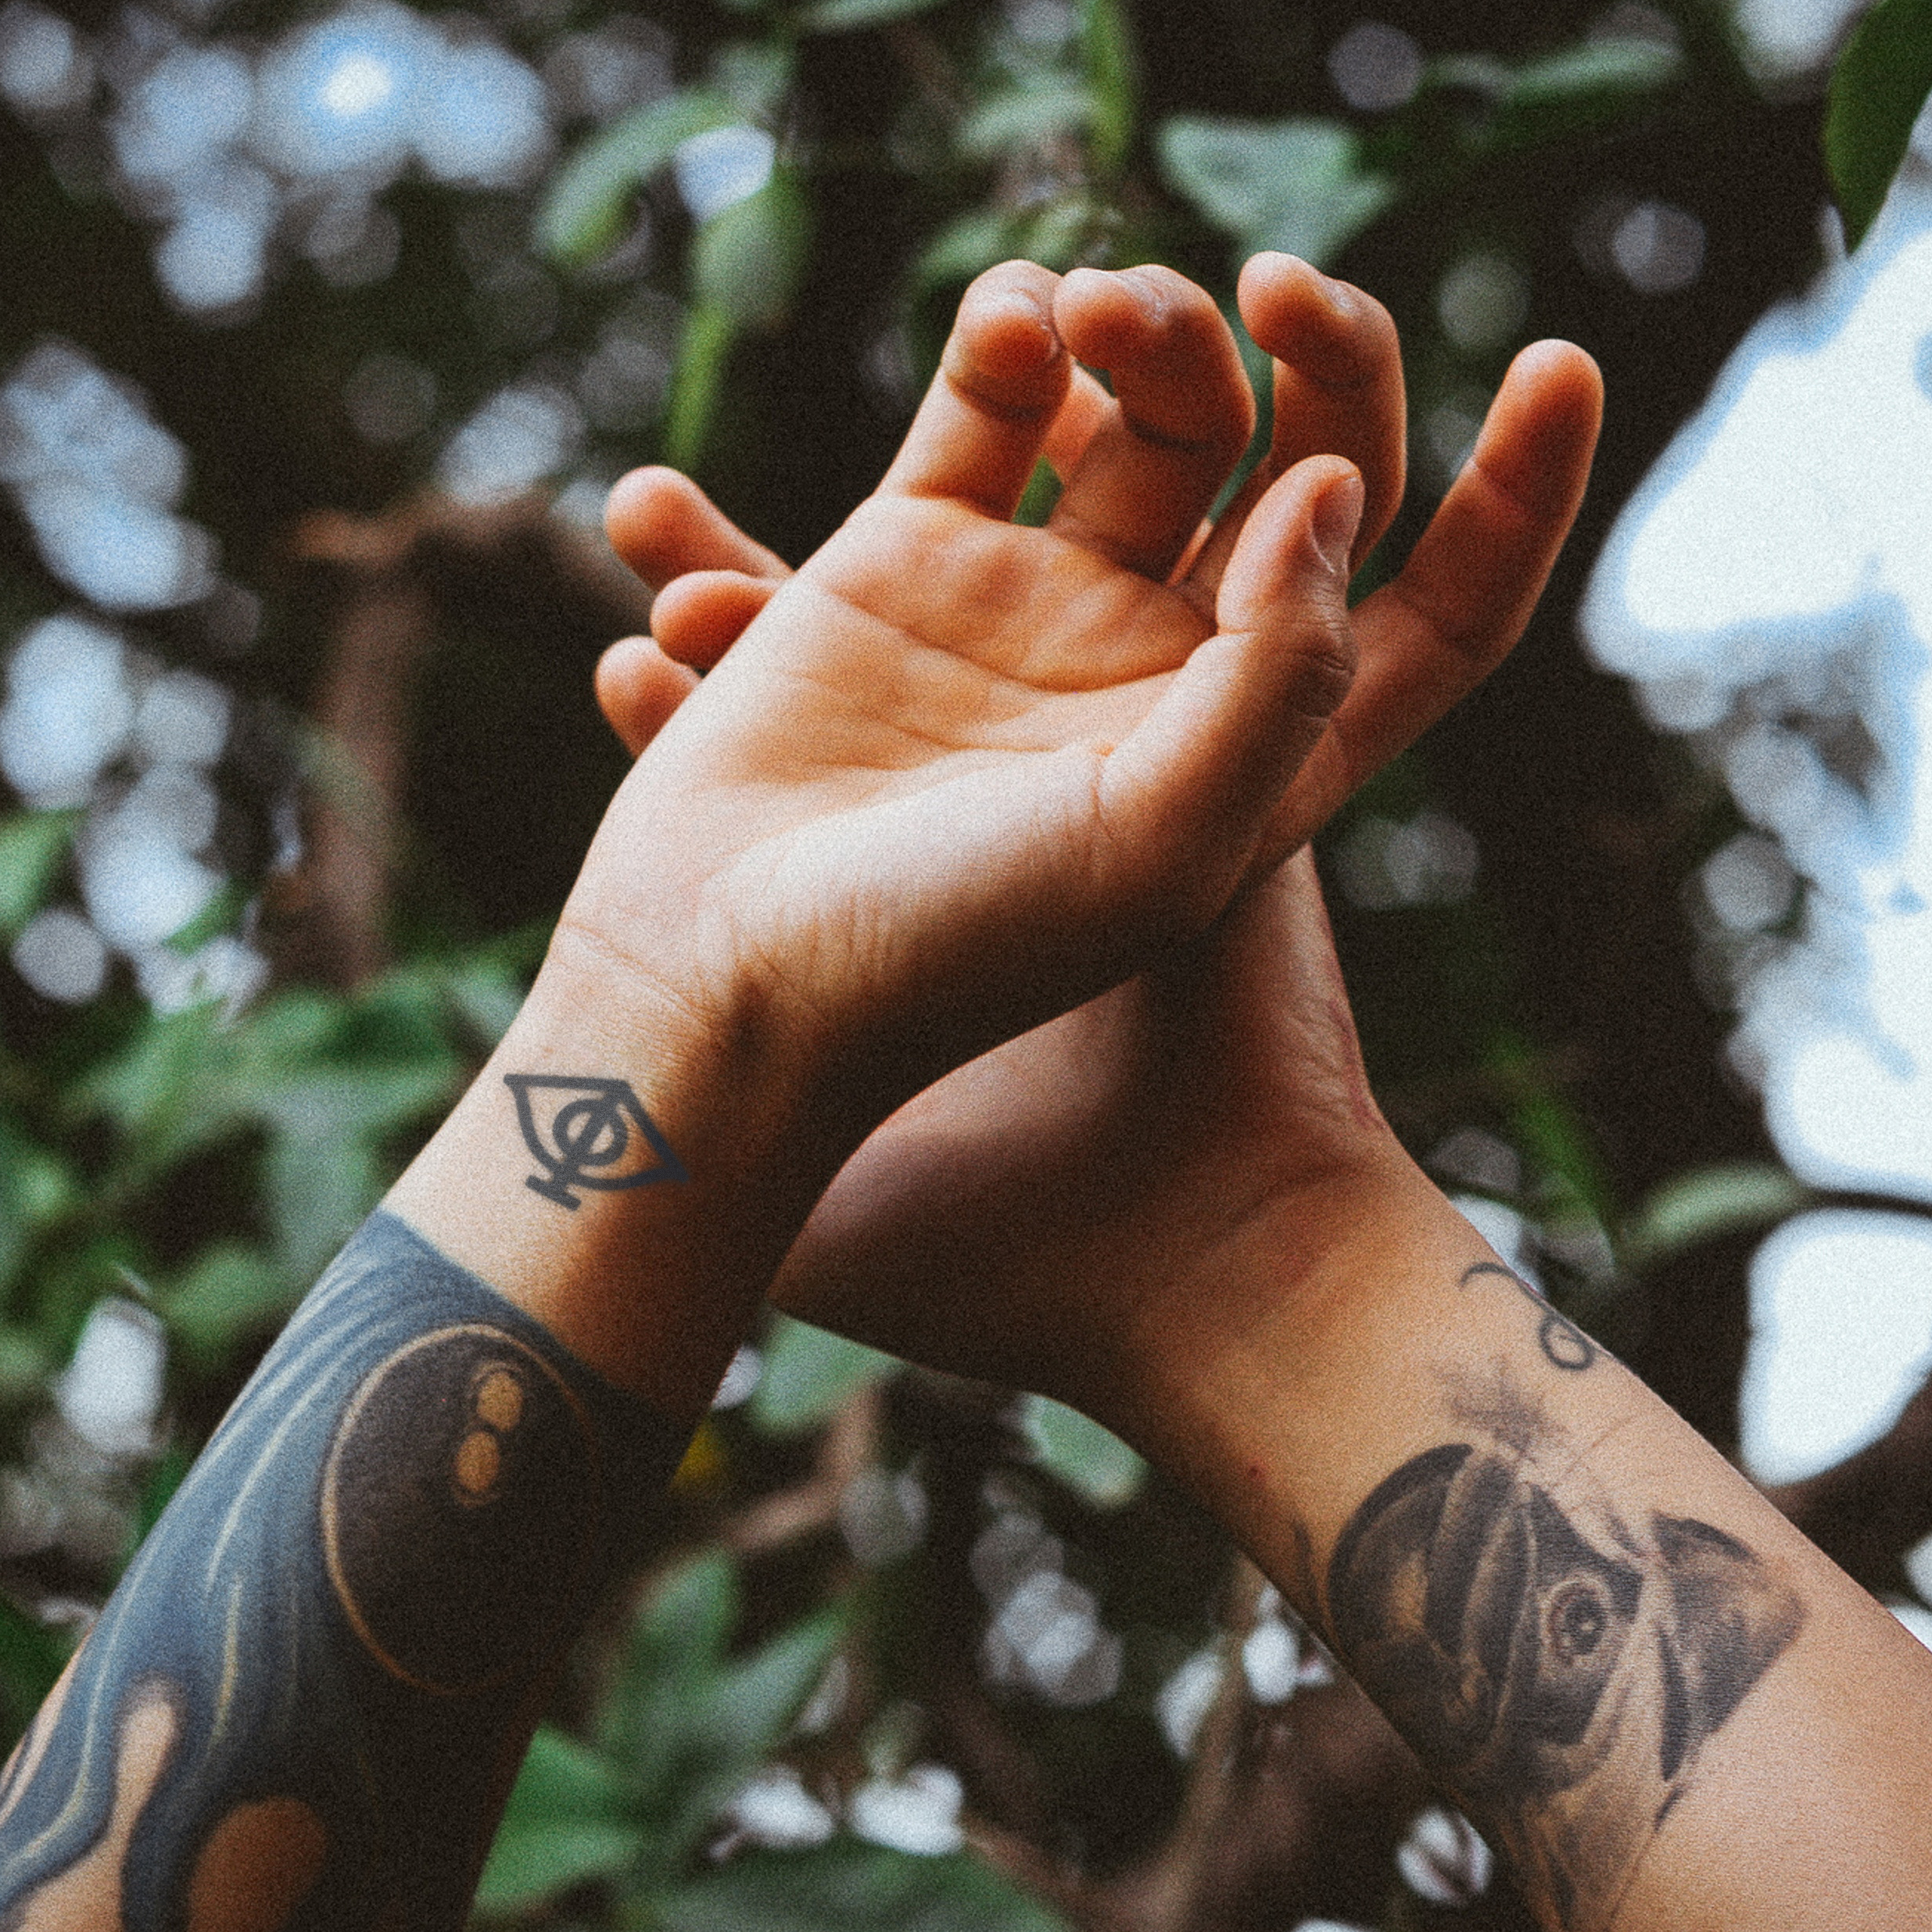 TO_Tattoo_V4 copy